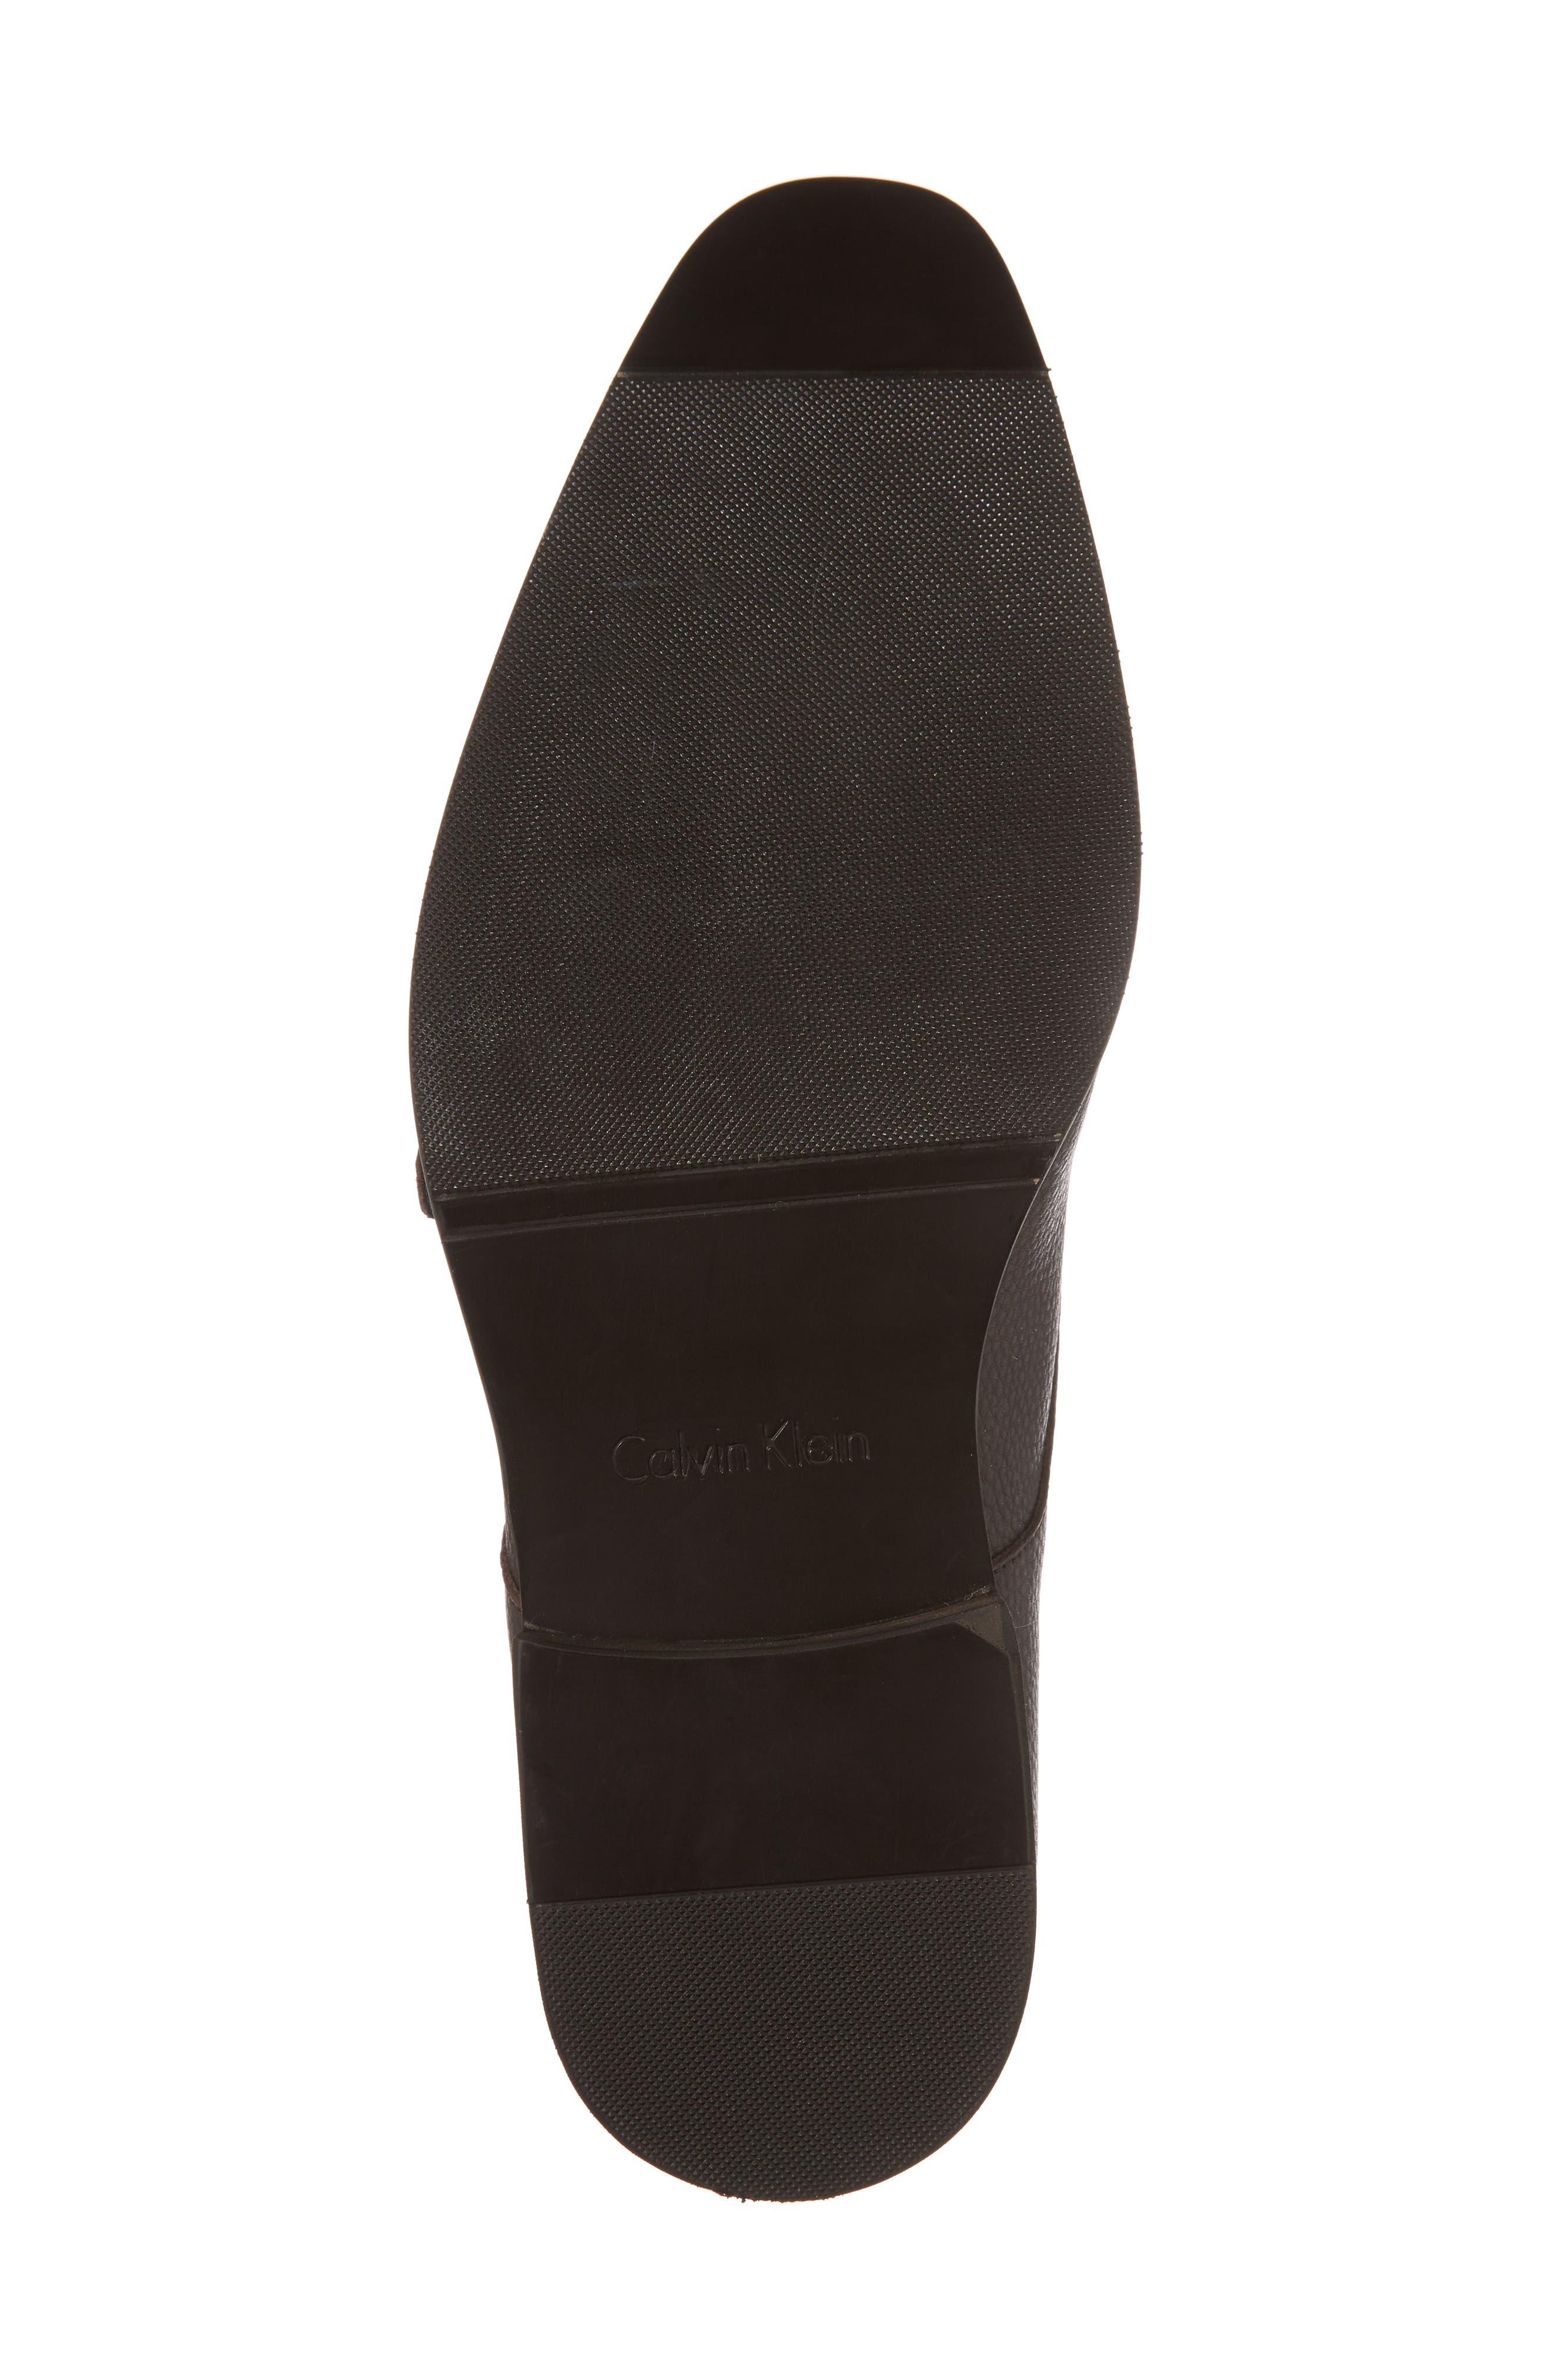 Robbie Double Monk Strap Shoe,                             Alternate thumbnail 6, color,                             Dark Brown Leather